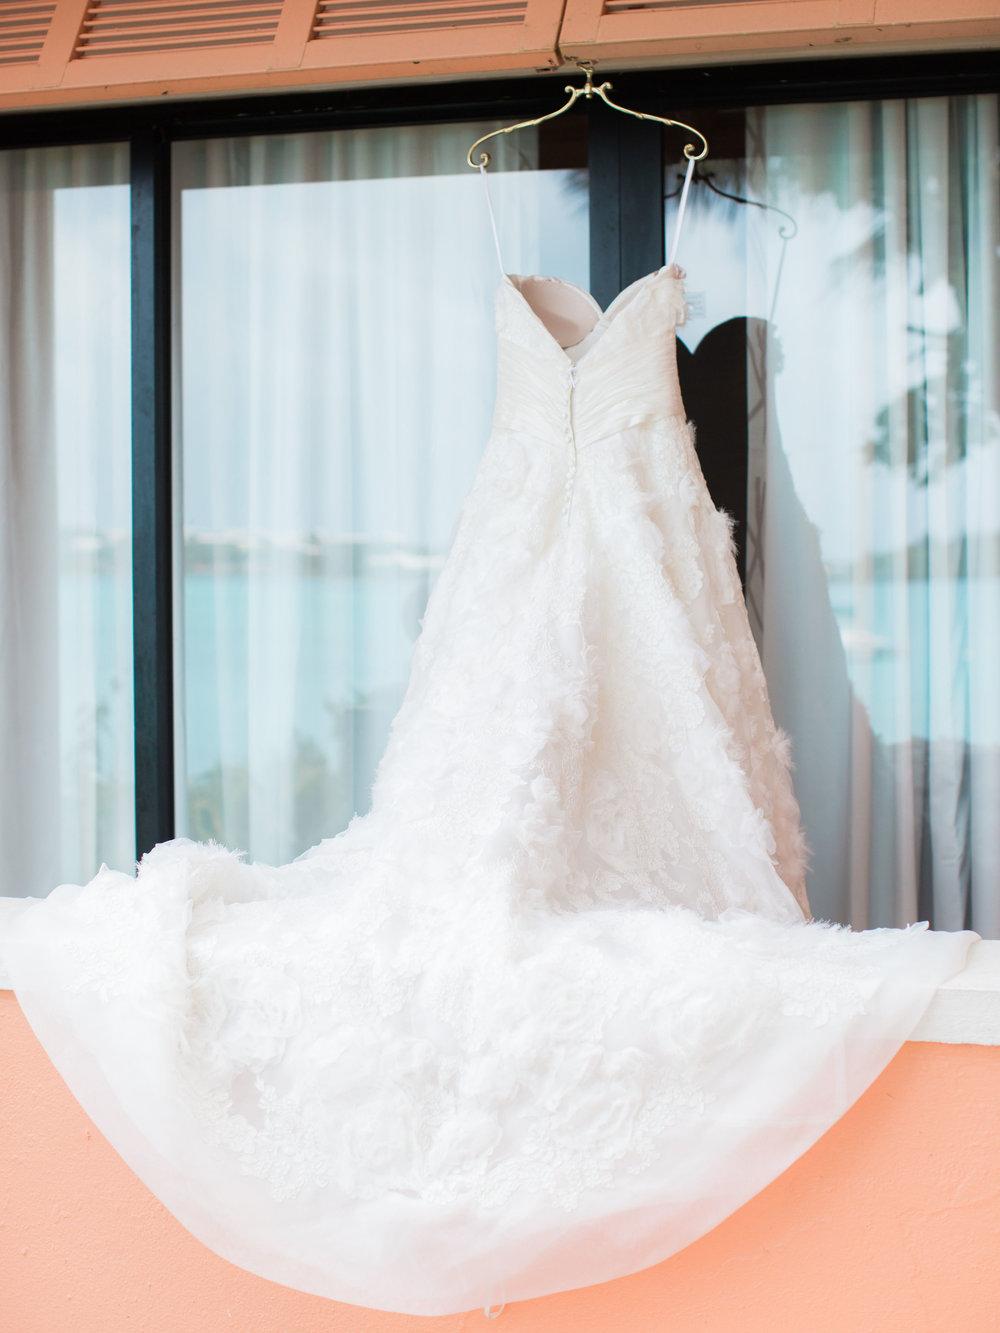 Bermuda Wedding | Andrea Rodway Photography